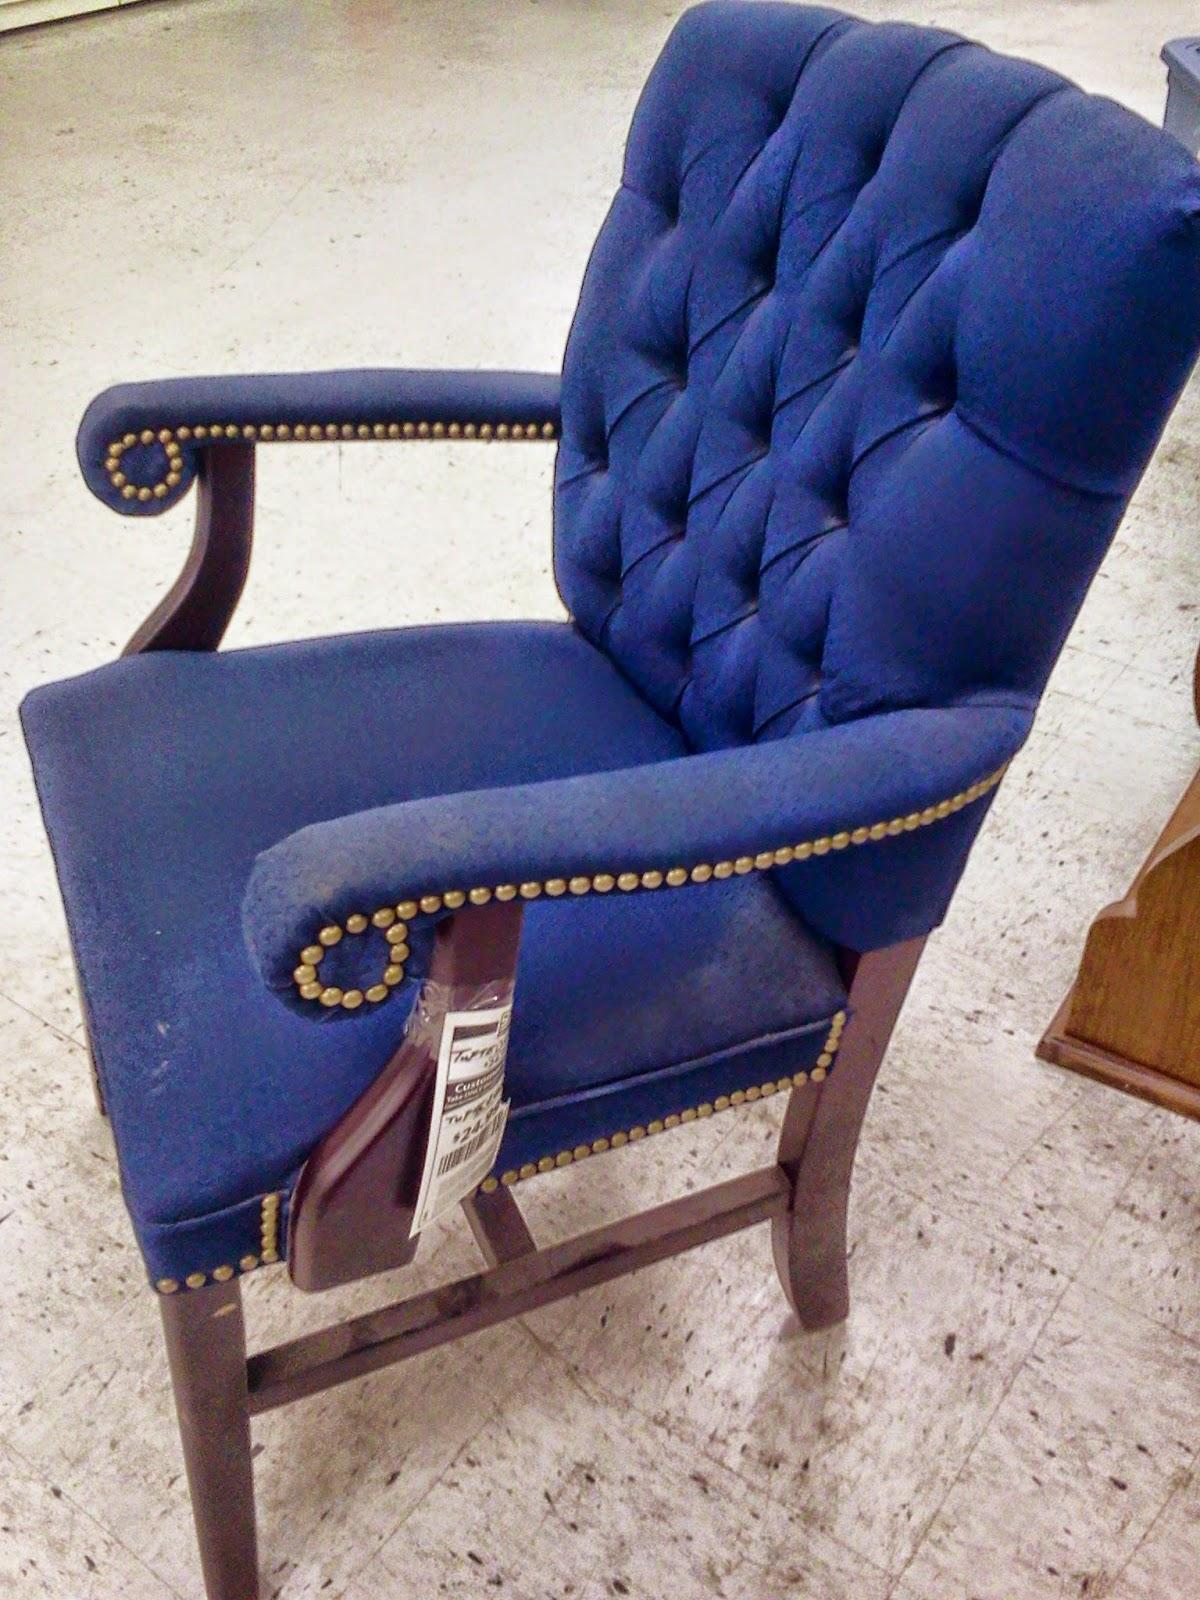 chair cushions navy chairs adirondack imperial blue